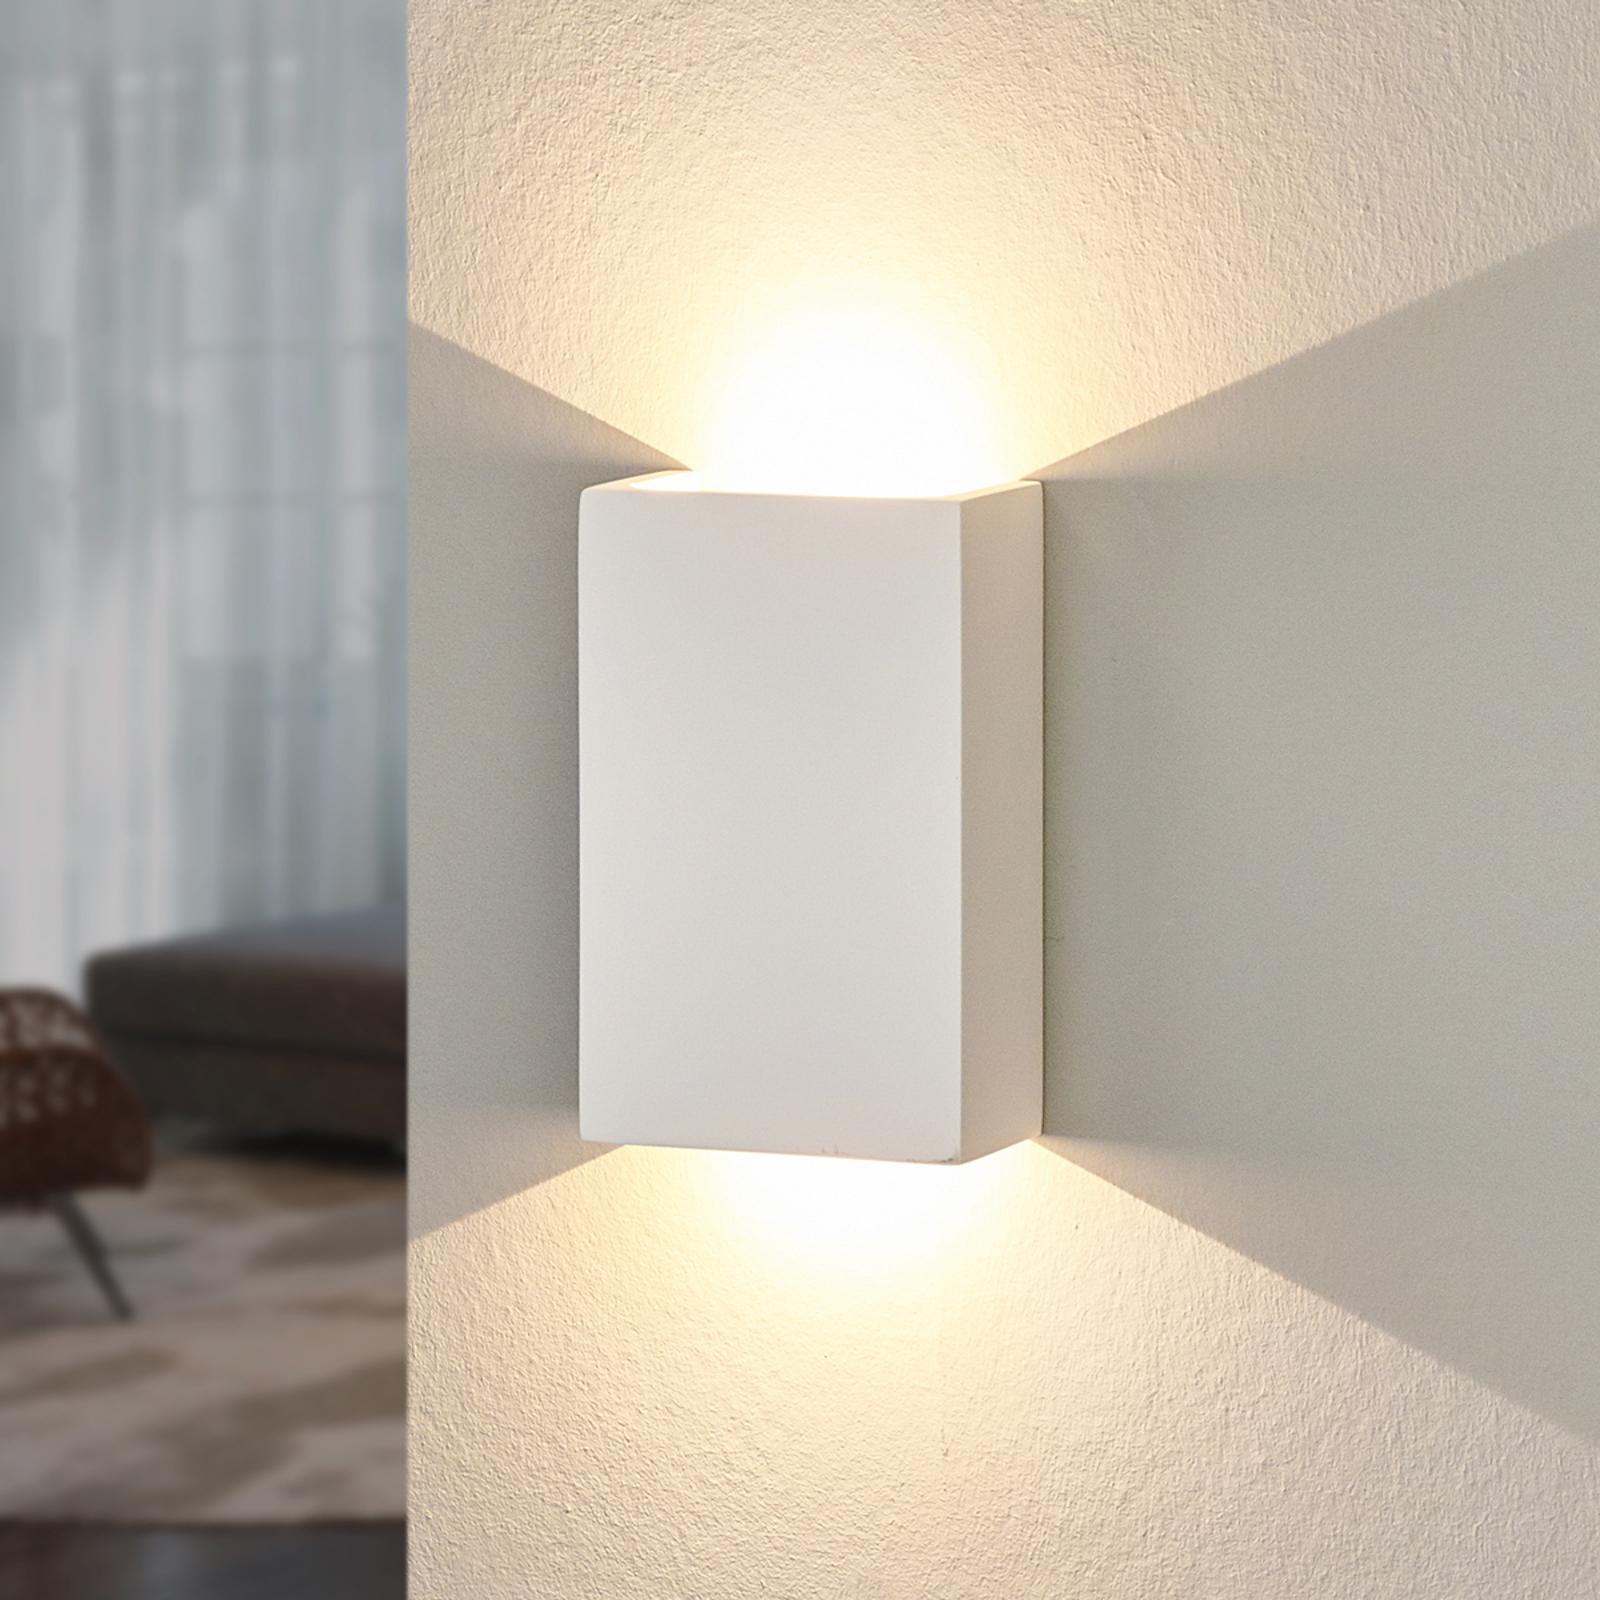 LED wandlamp Fabiola van gips, hoogte 16 cm